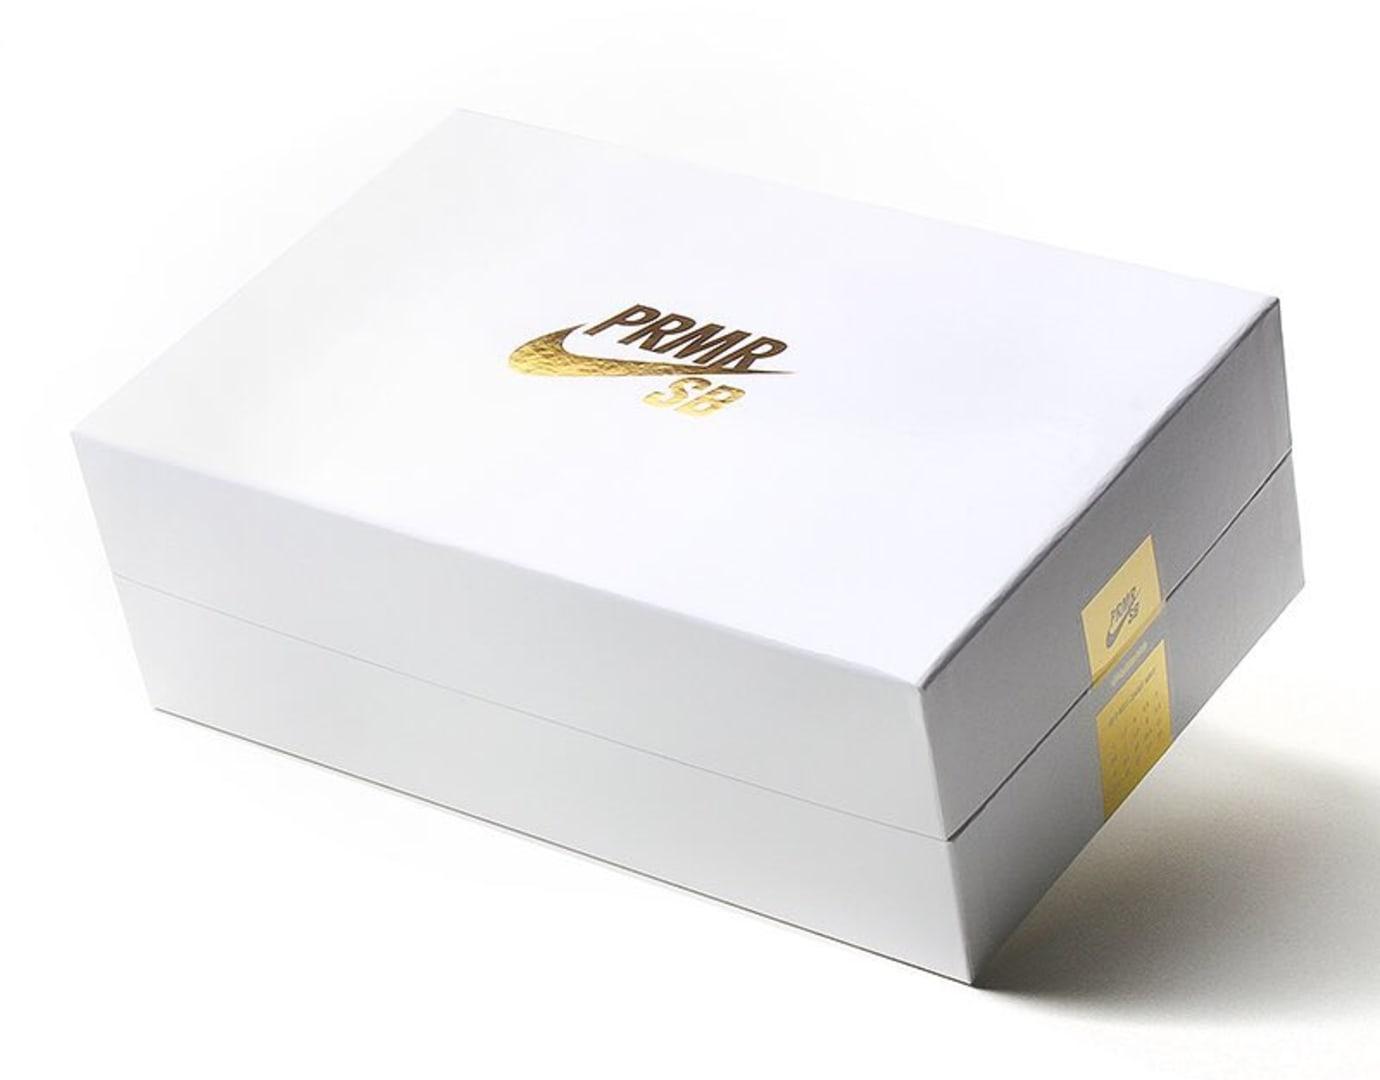 Premier x Nike SB Dunk High TRD (Box)